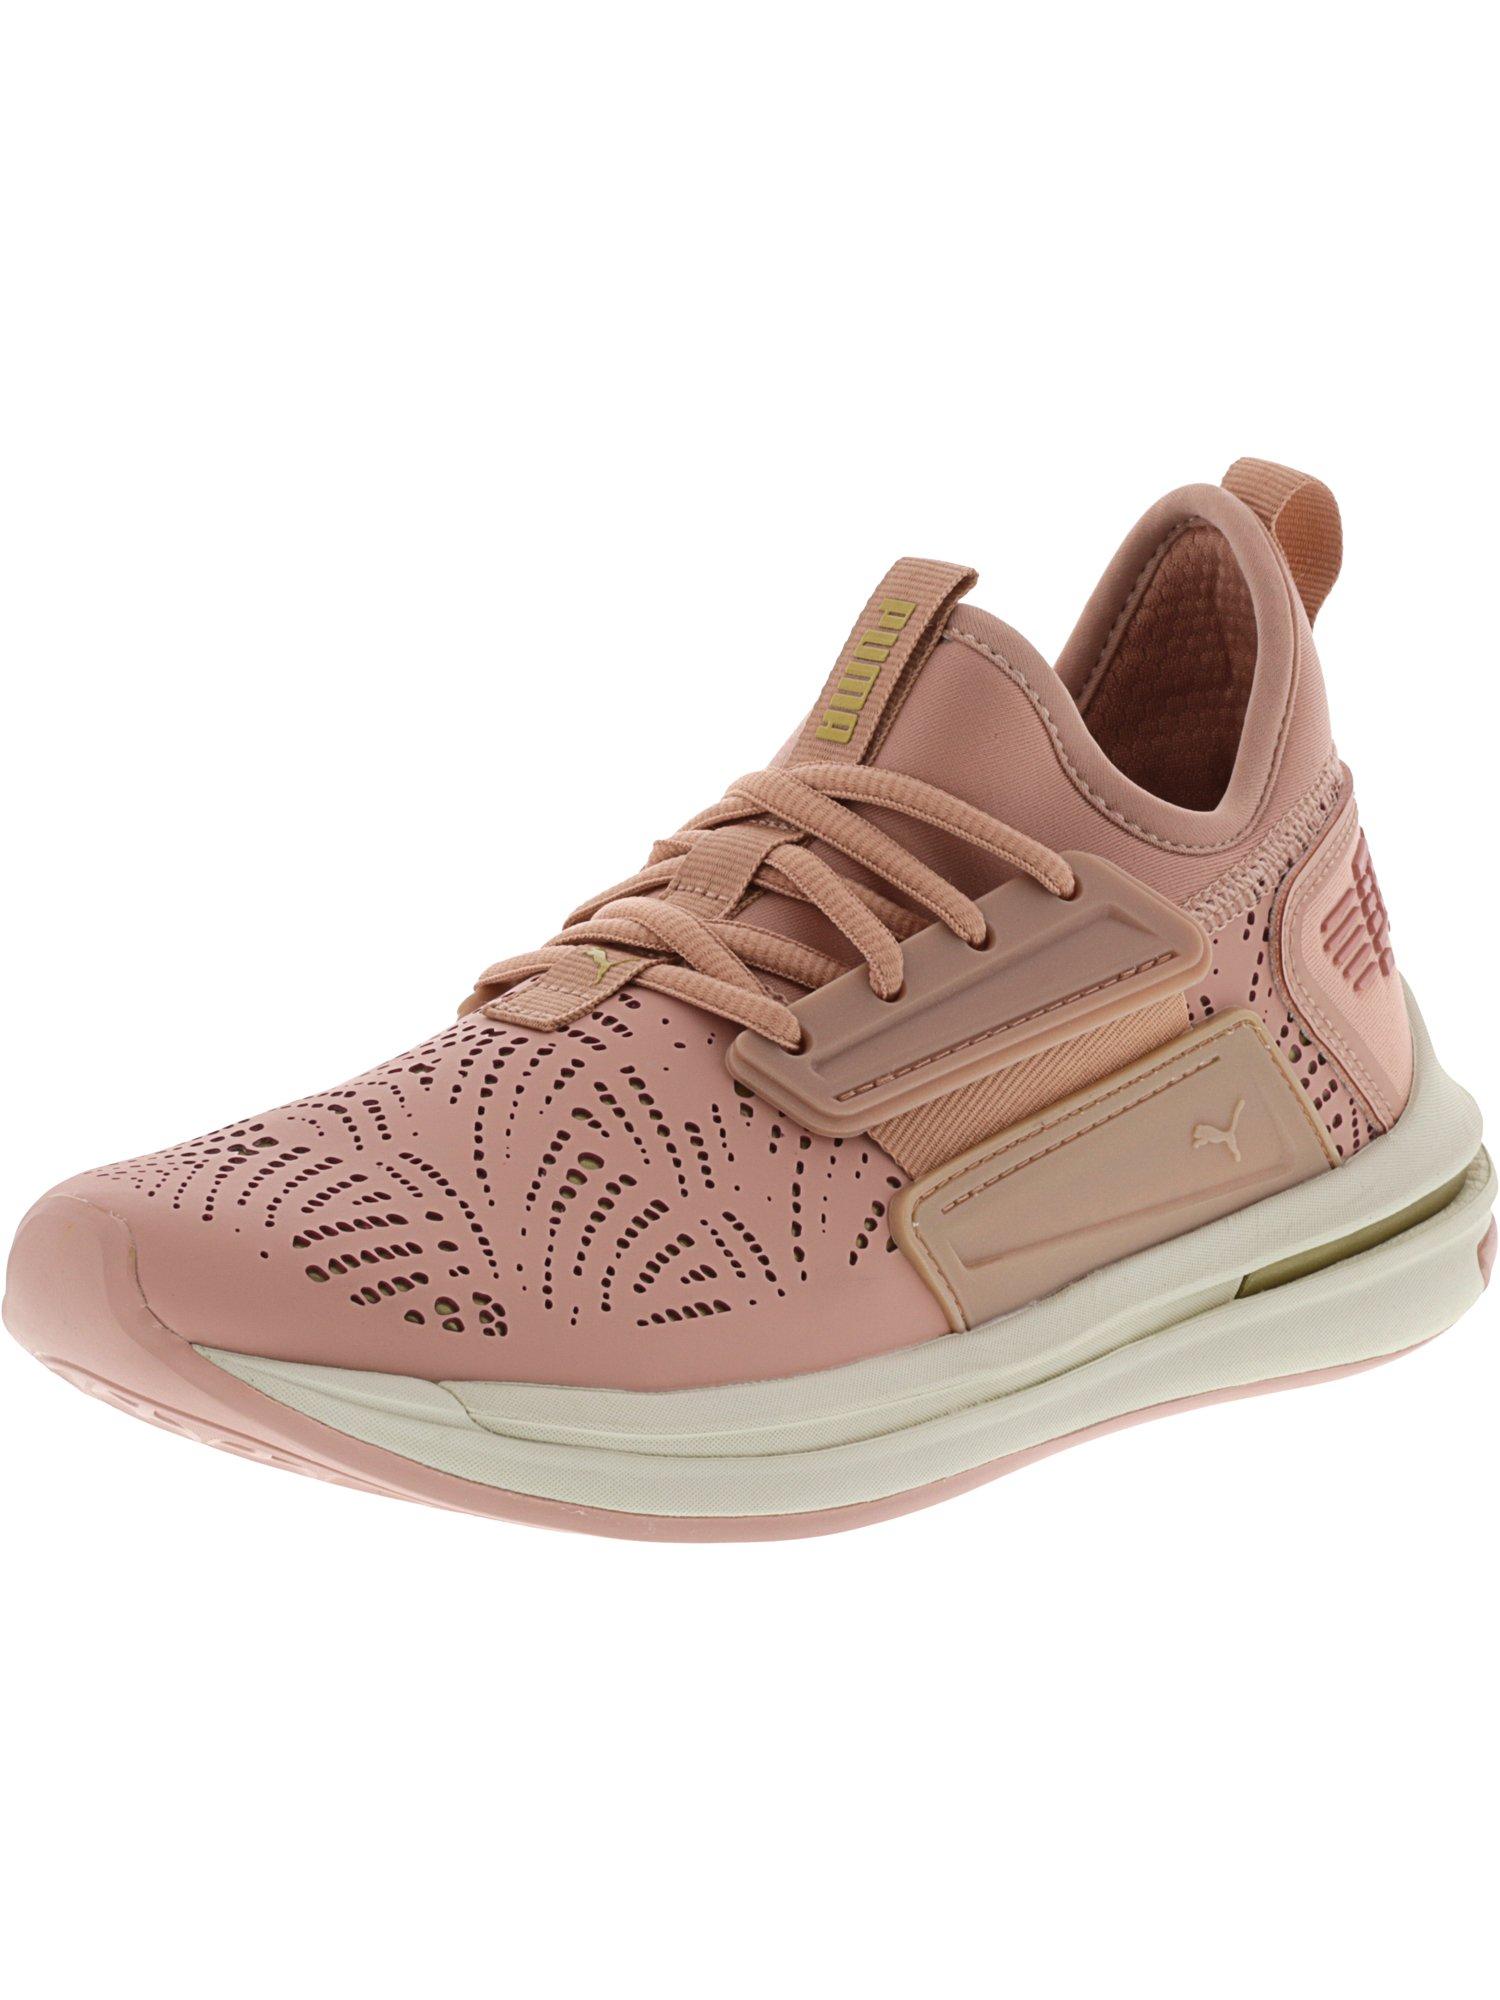 Puma Women's Ignite Limitless Sr Lc Peach Beige / Gold Ankle-High Running Shoe - 8M